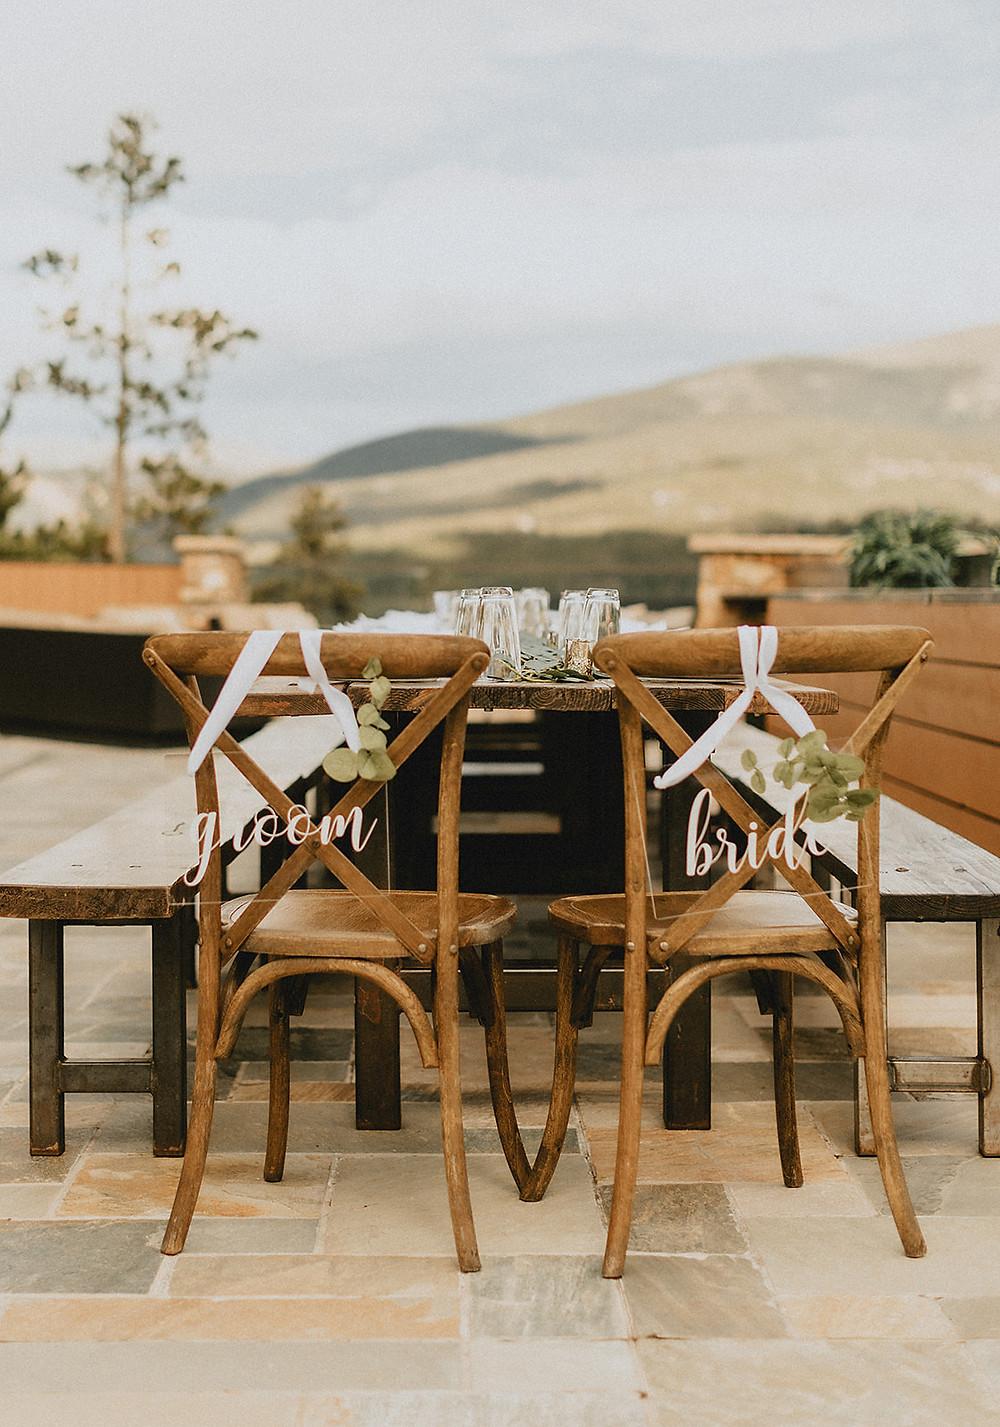 Chateau of Breckenridge - Breckenridge Wedding - Wedding Table